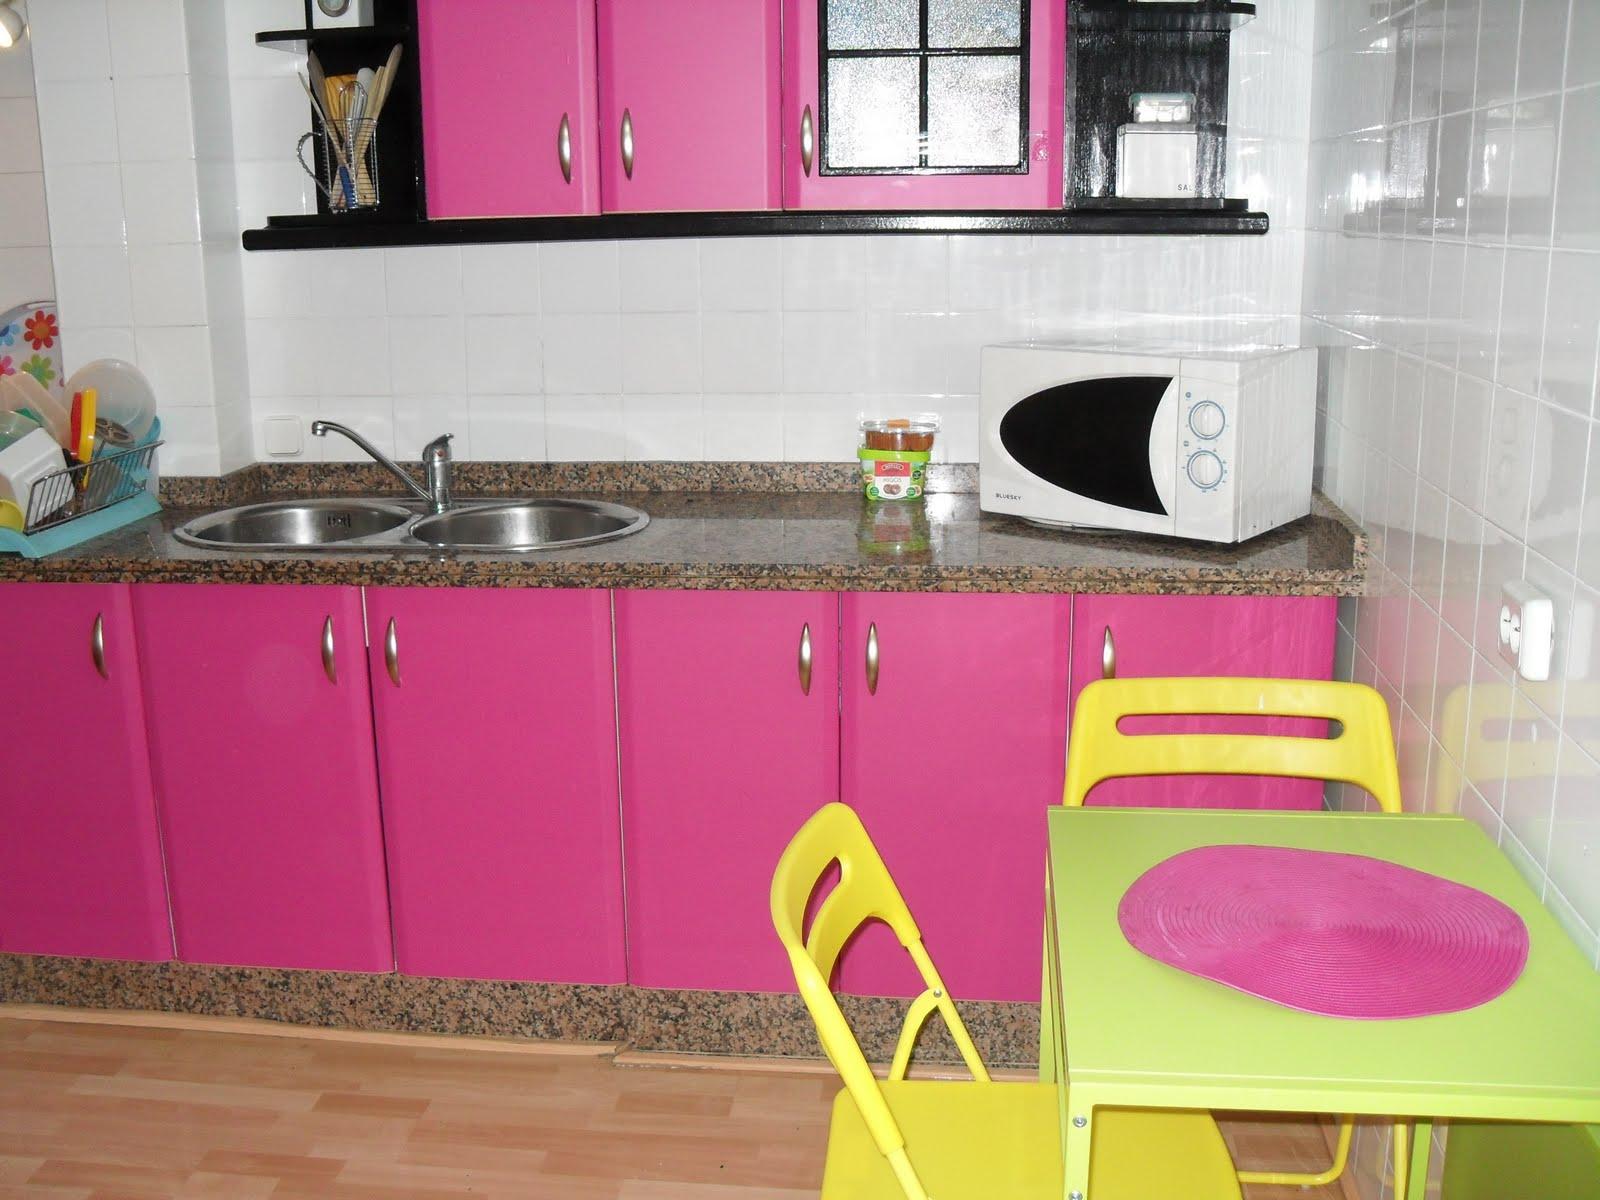 Naifandtastic decoraci n craft hecho a mano restauracion muebles casas peque as boda antes - Pegatinas para cocinas ...